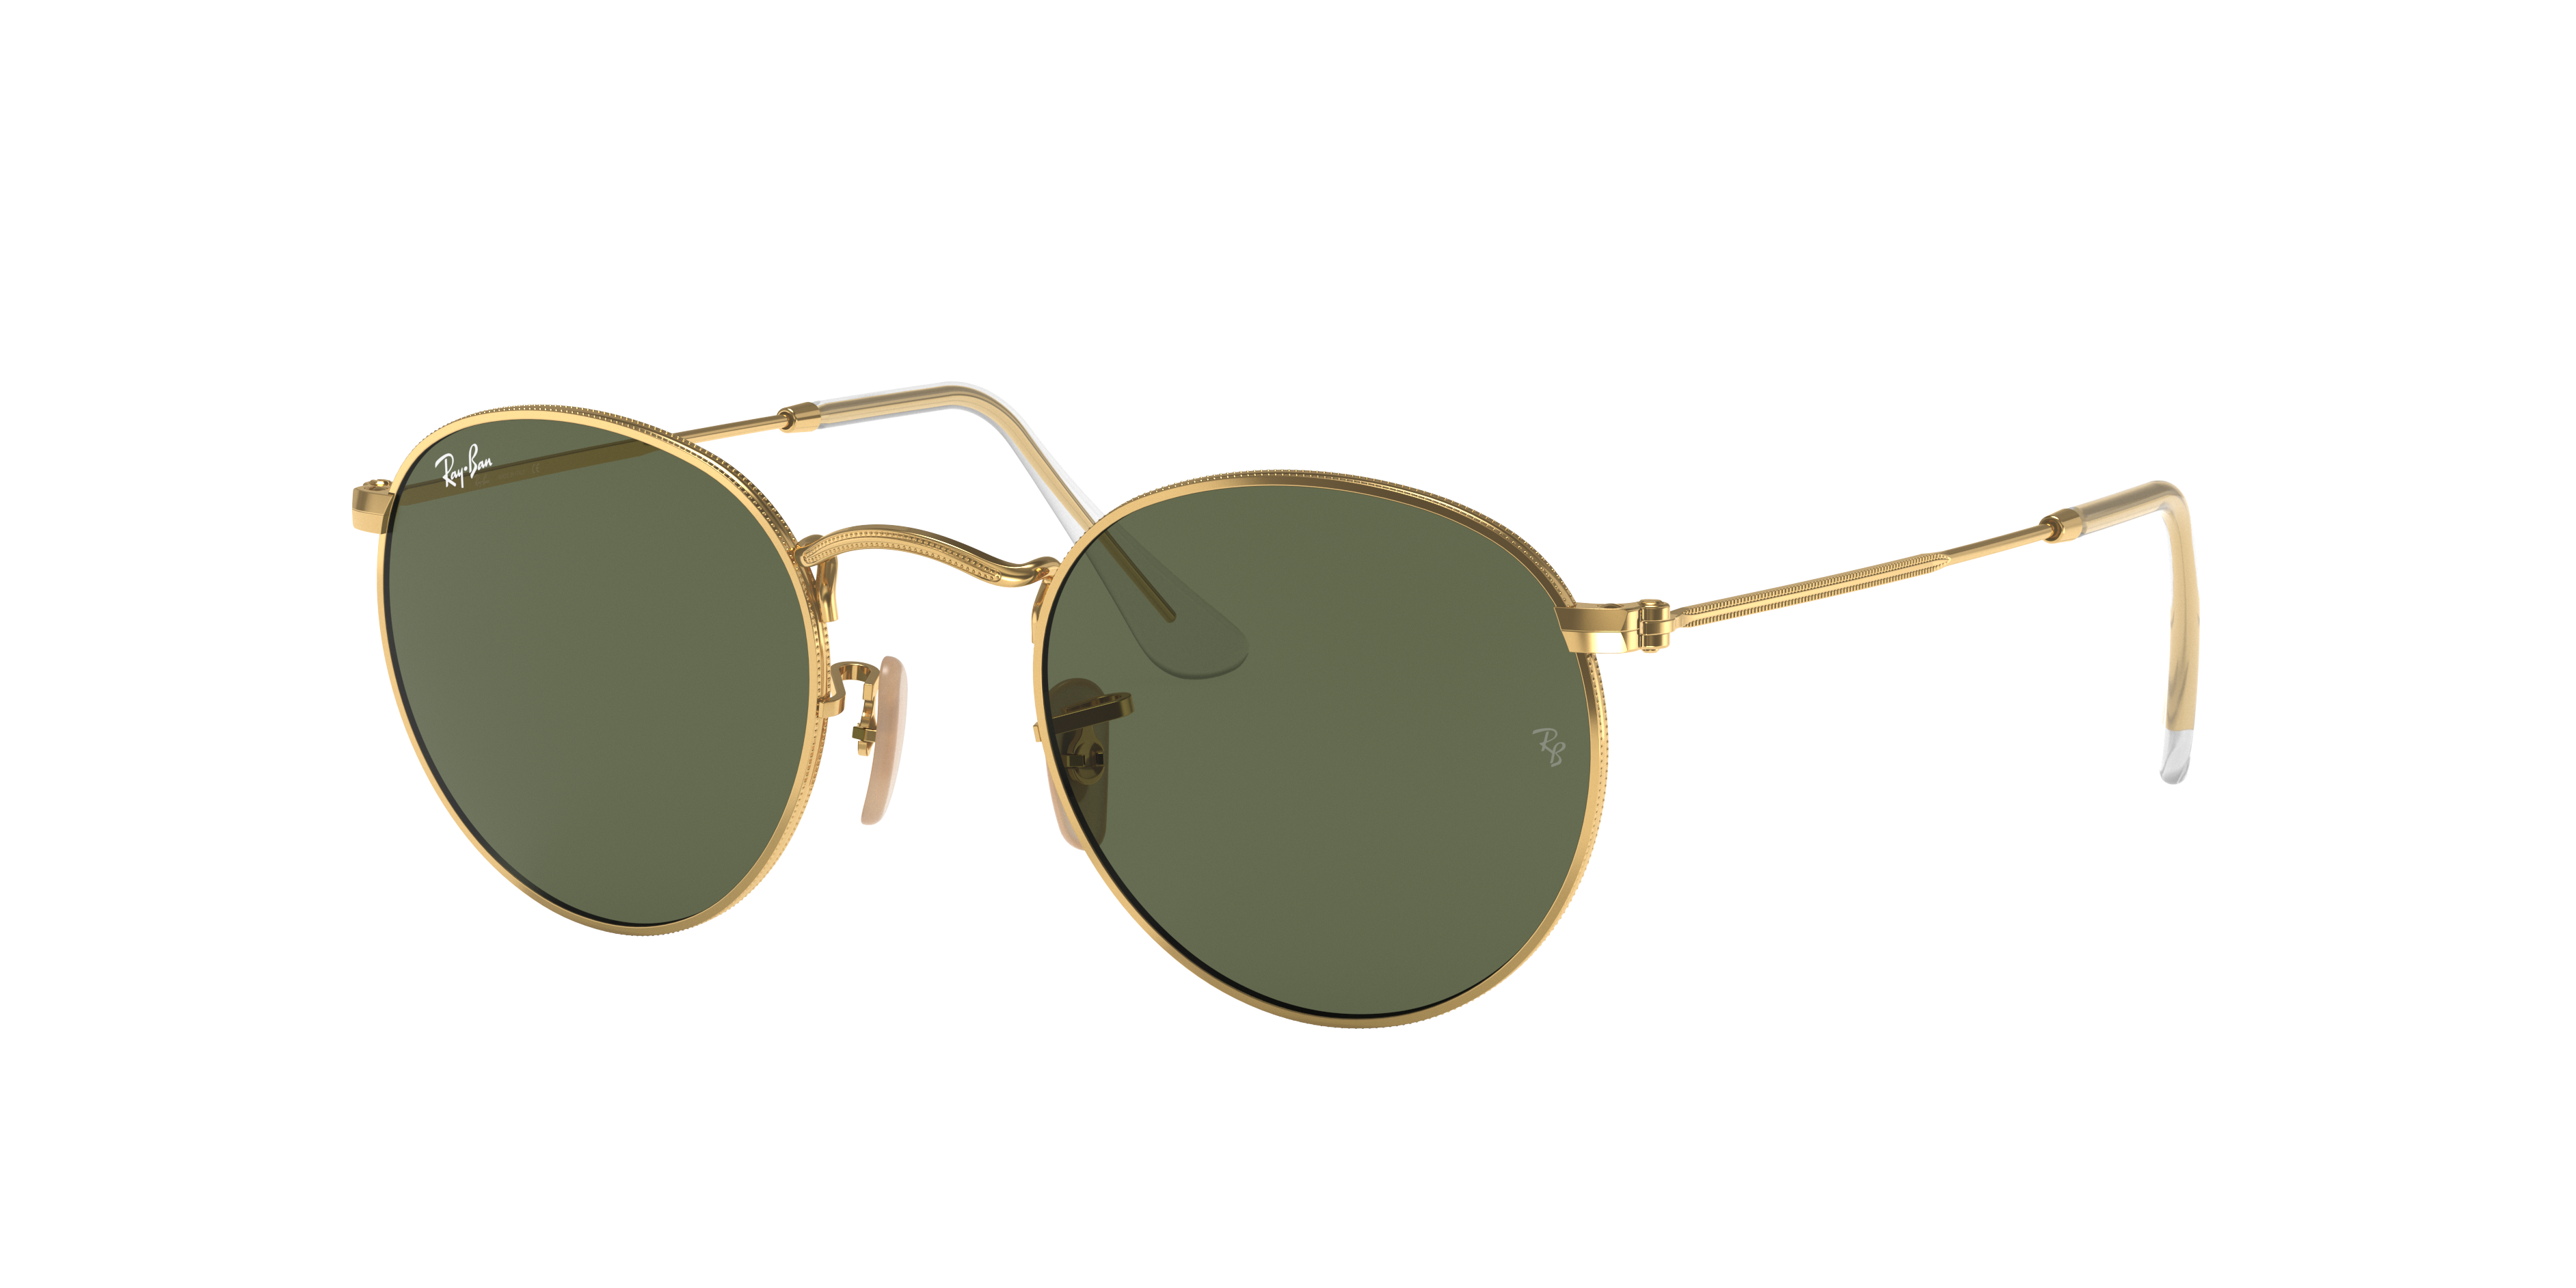 Ray-Ban Round Flat Lenses Gold, Green Lenses - RB3447N